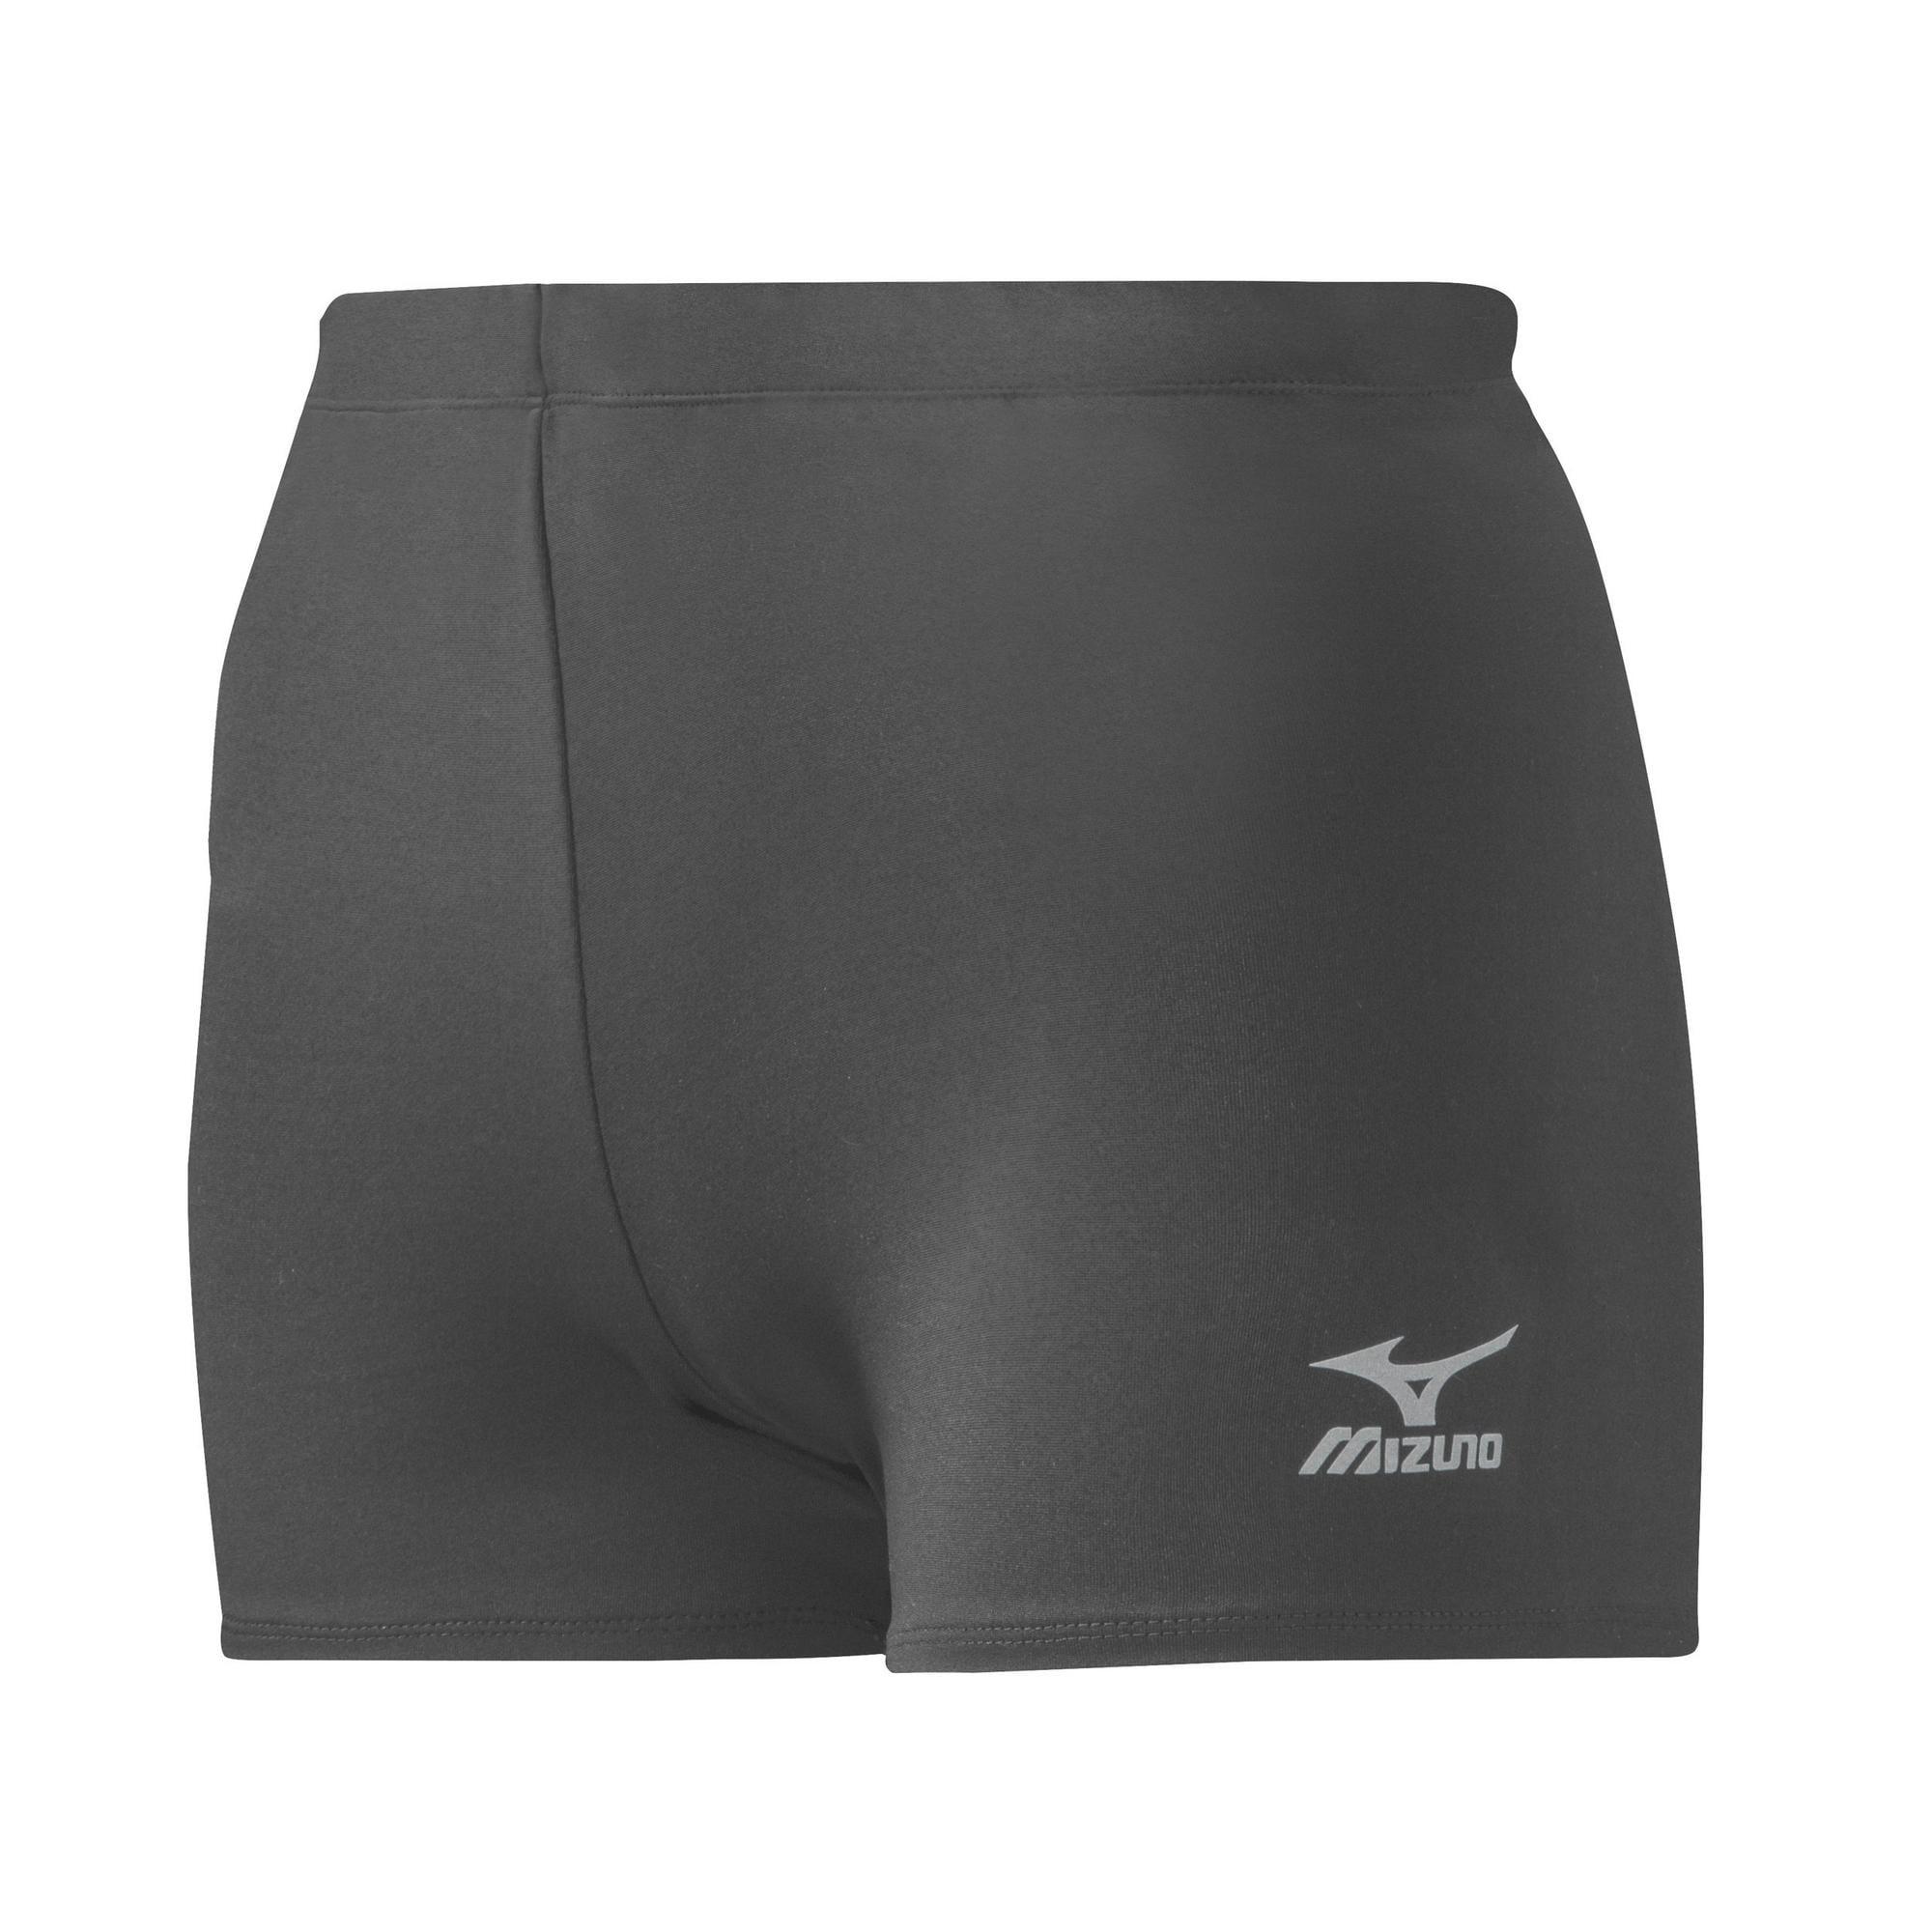 mizuno youth volleyball shorts 2019